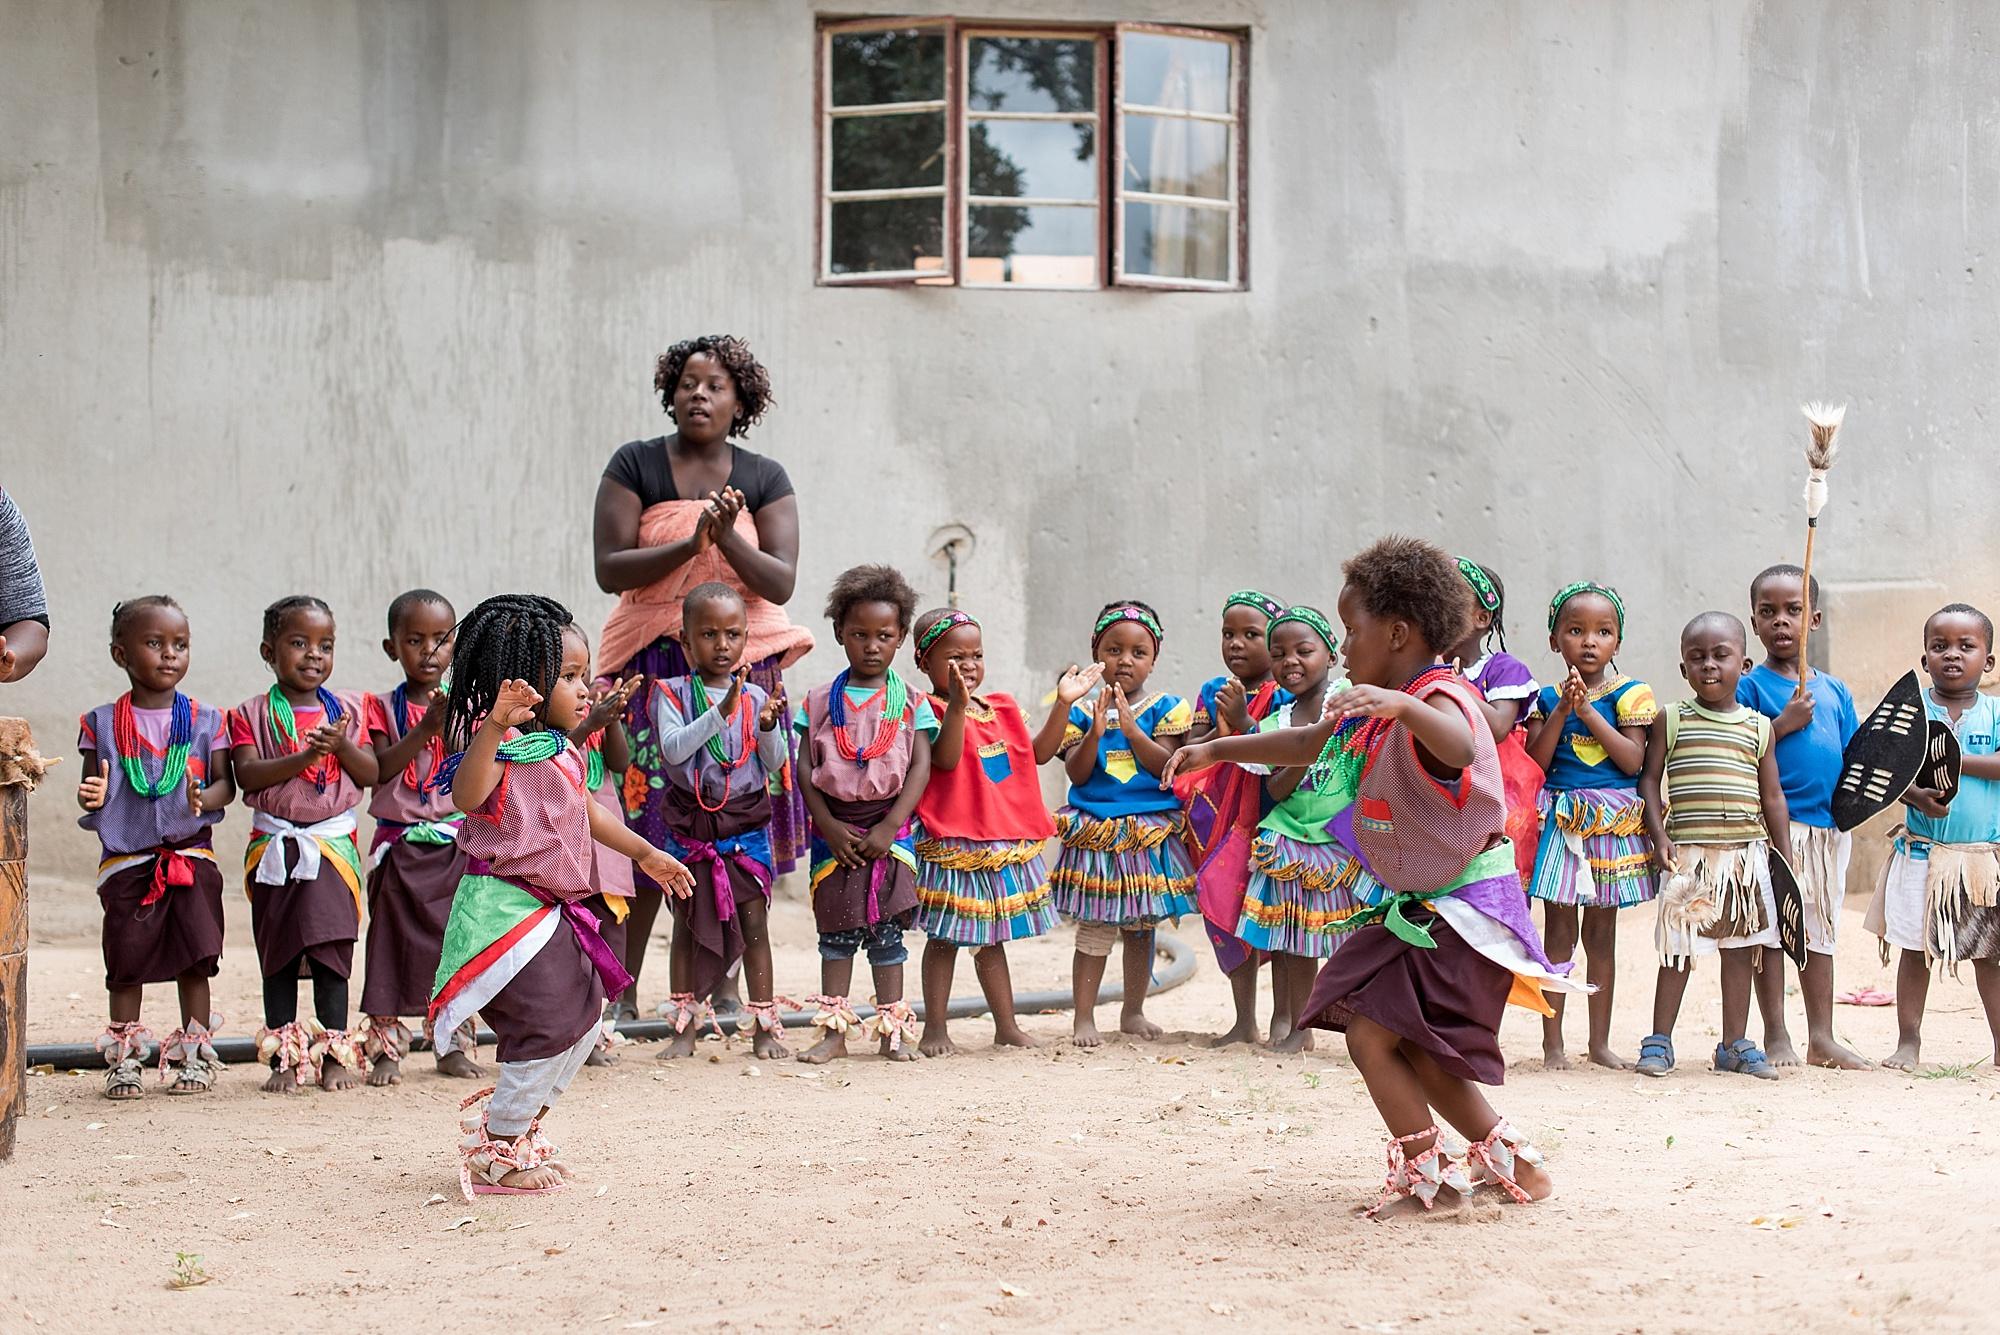 Darren-Bester-Photographer-Royal-Malewane-Sigagule-Nhlumuko-Creche_0019.jpg